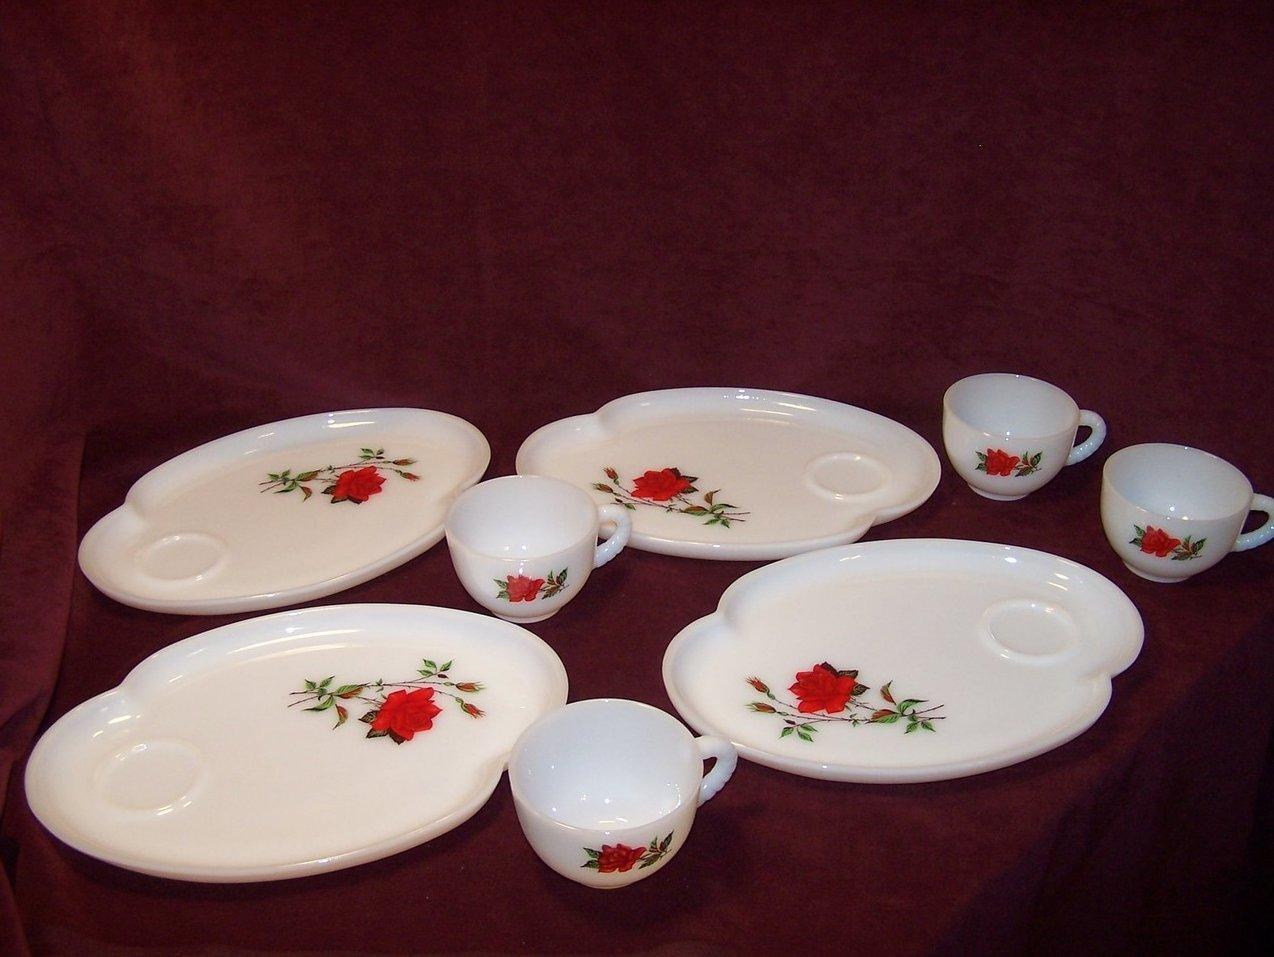 Image 3 of Snack Plate, Teacup,  Rosecrest Milk Glass, Federal Glass